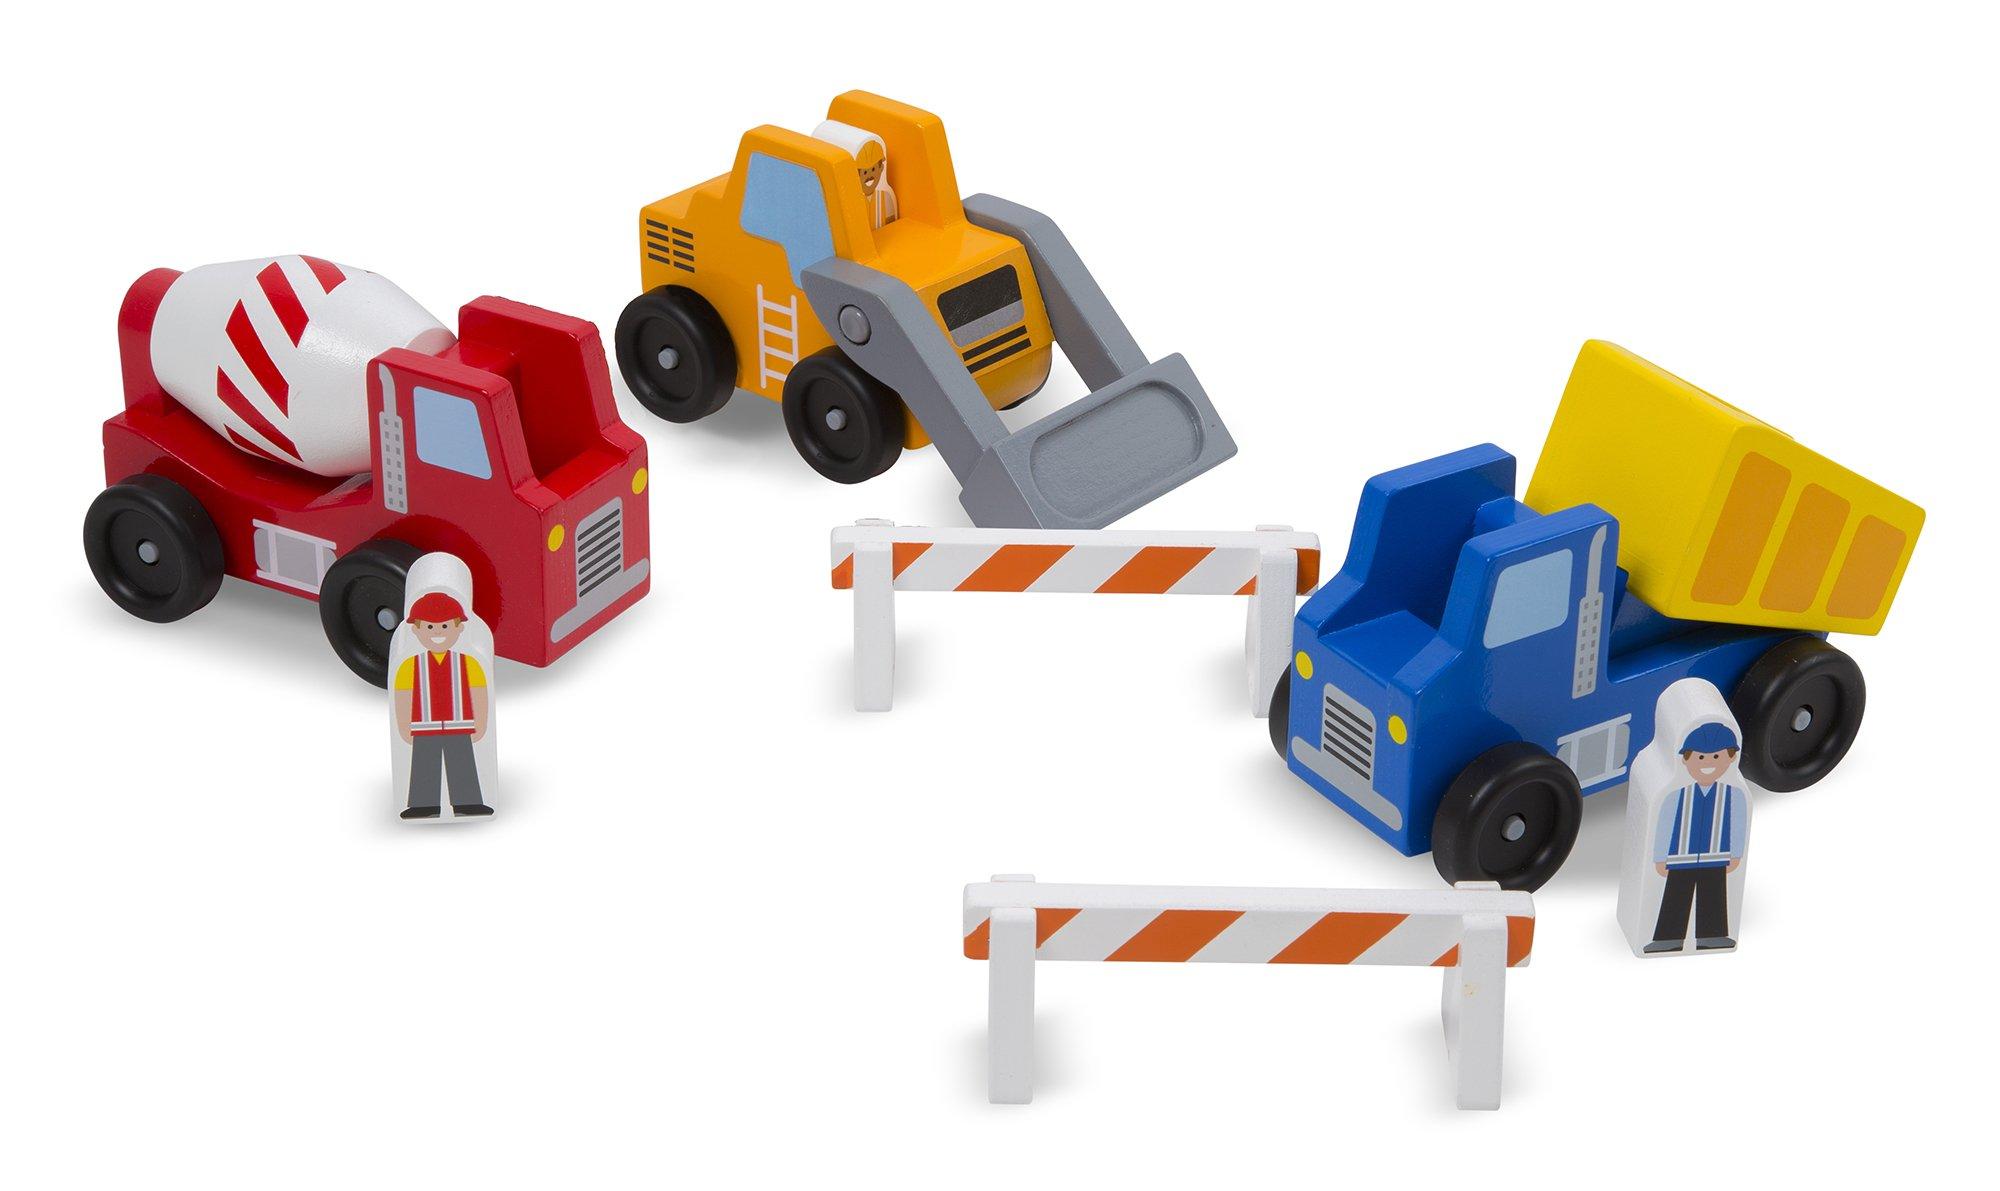 Construction Toys Product : Melissa doug construction vehicle wooden play set pcs